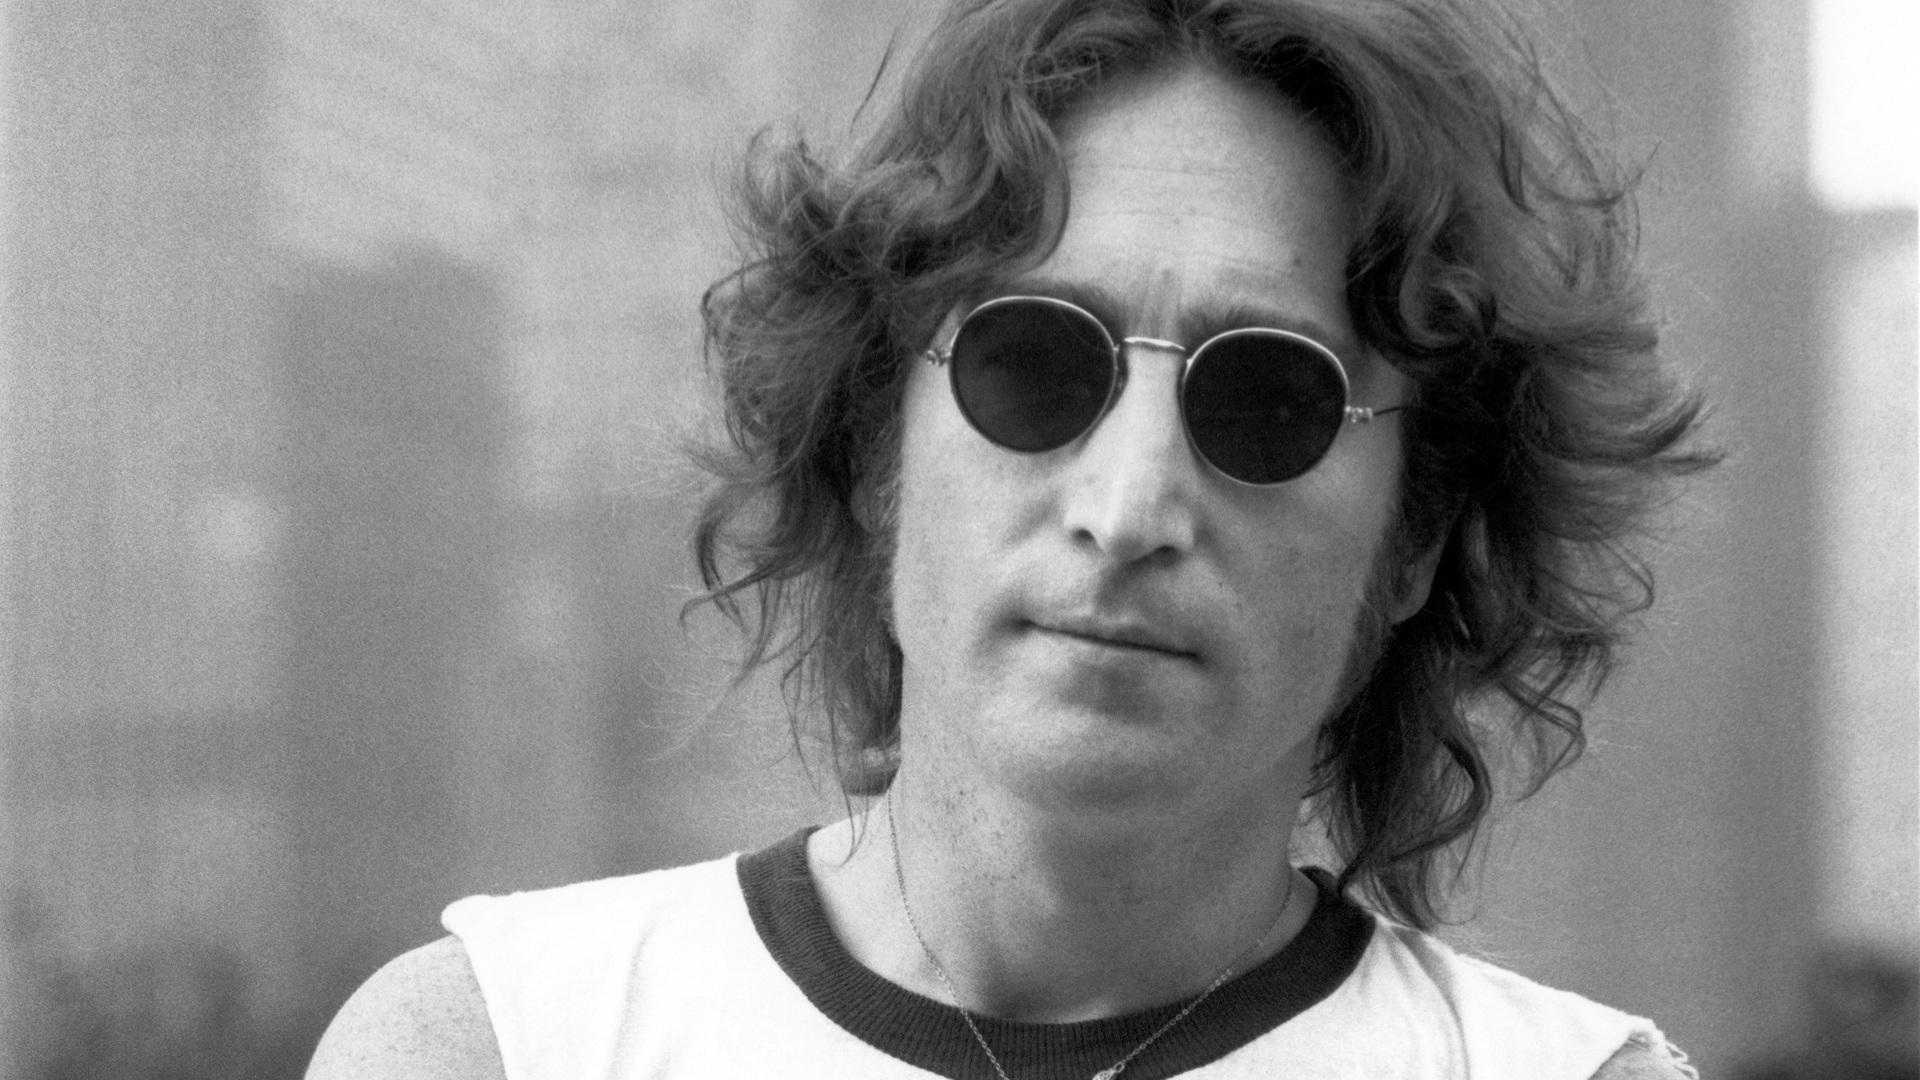 John Lennon Hd Wallpaper